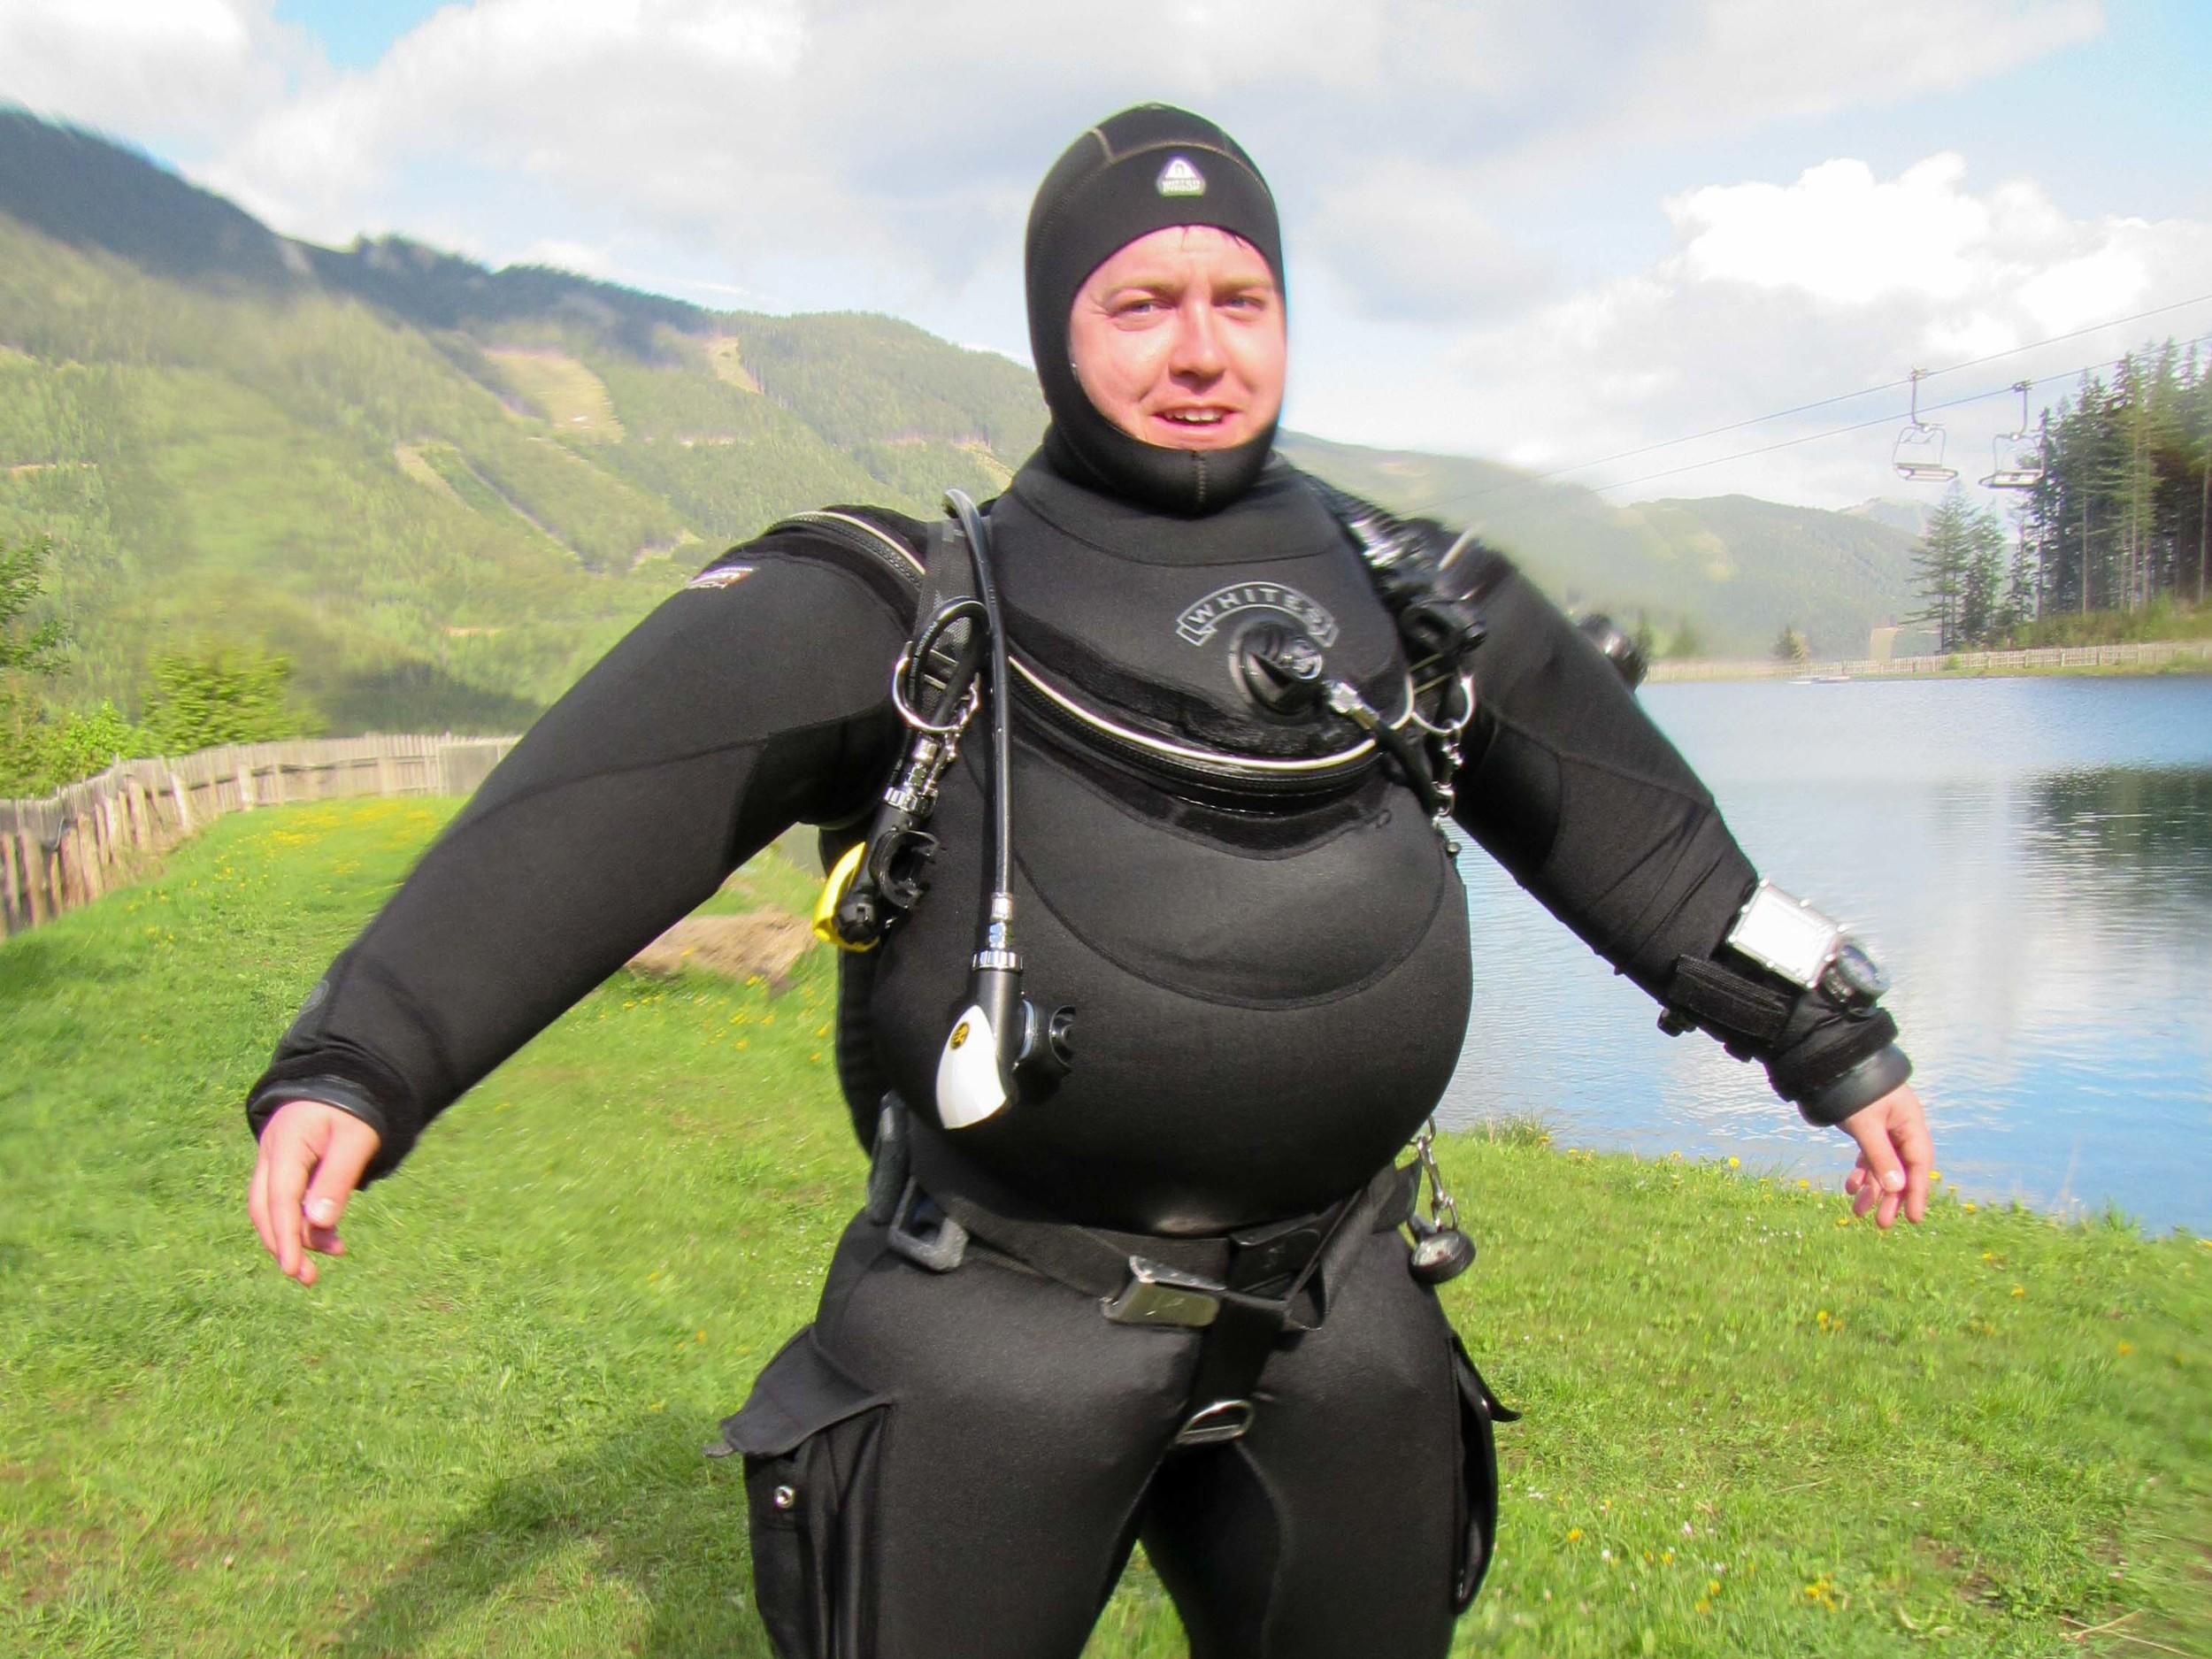 Fat man in a little suit?